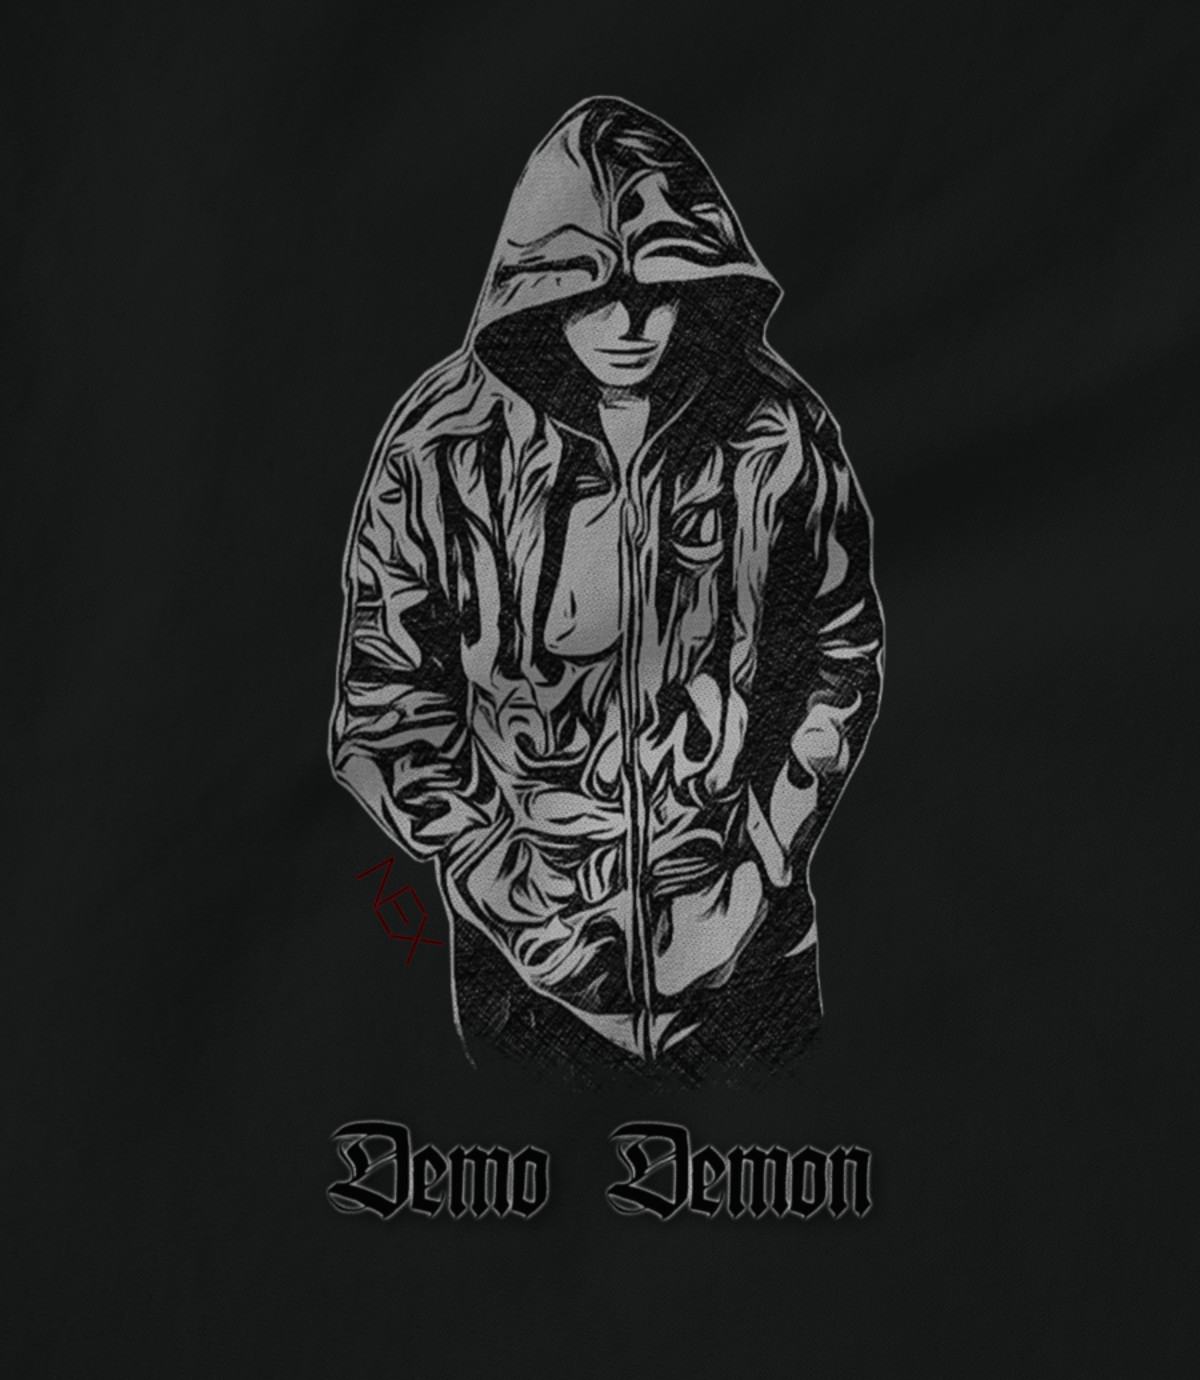 Demo demon the ghost  nex edition  1521169031